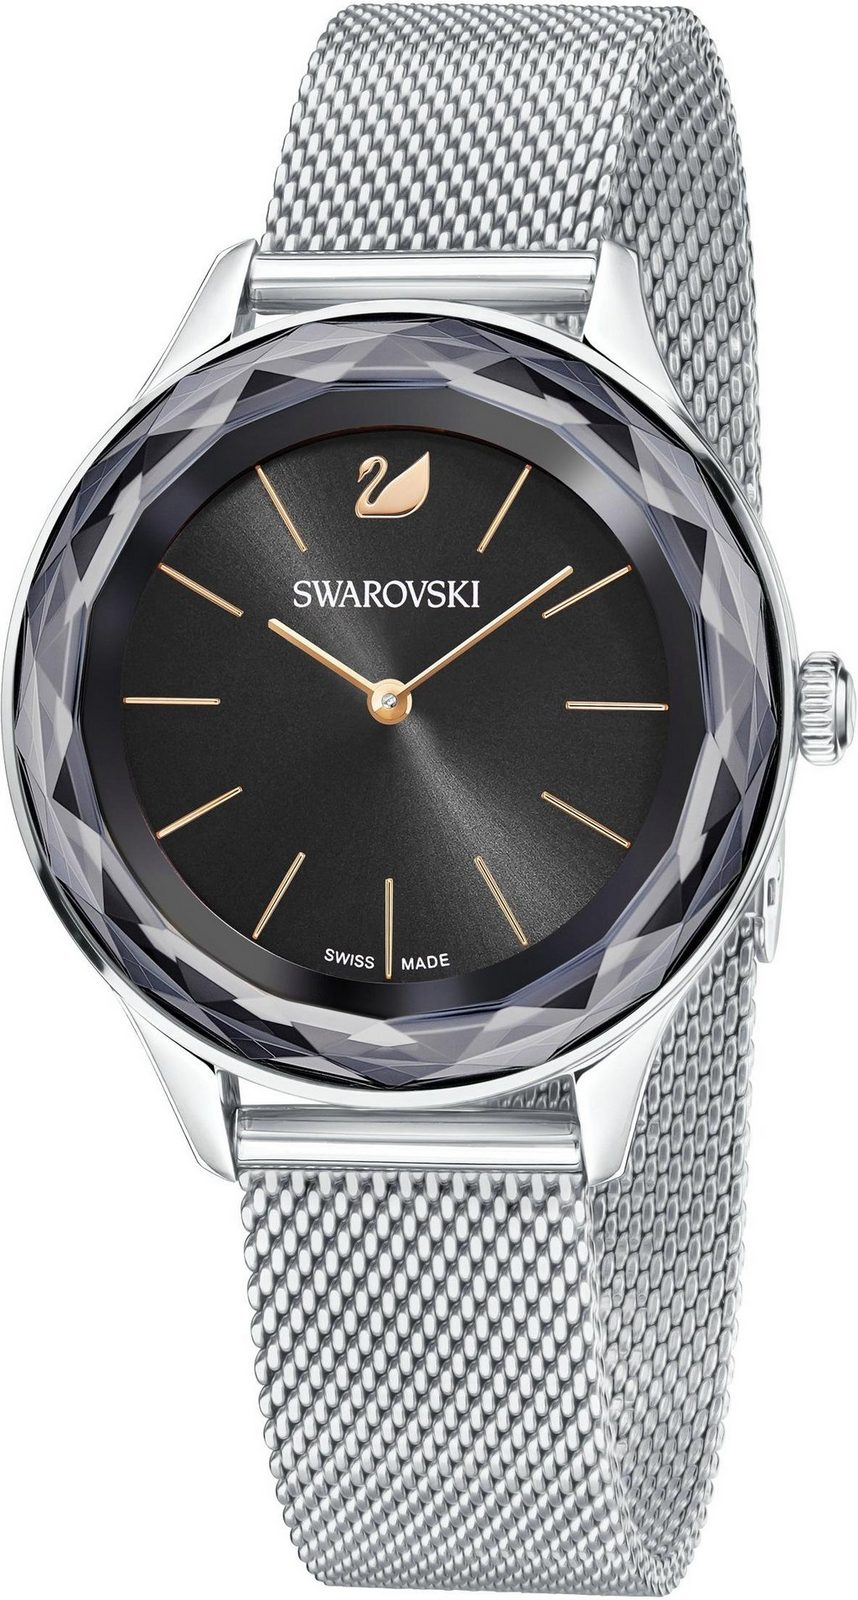 Swarovski Schweizer Uhr »Octea Nova, 5430420«